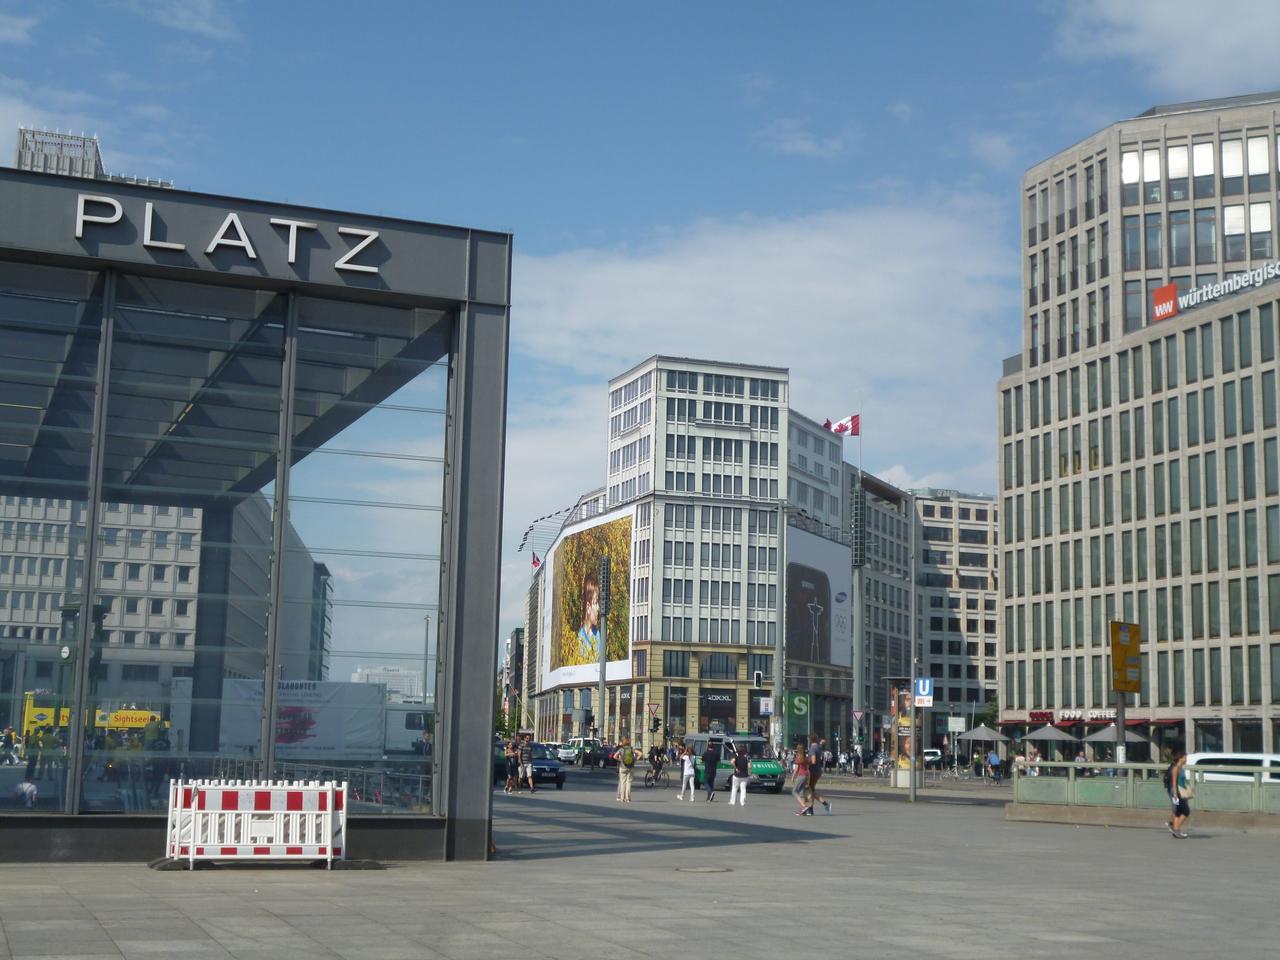 leipzigerplatz-18197sl13.jpg